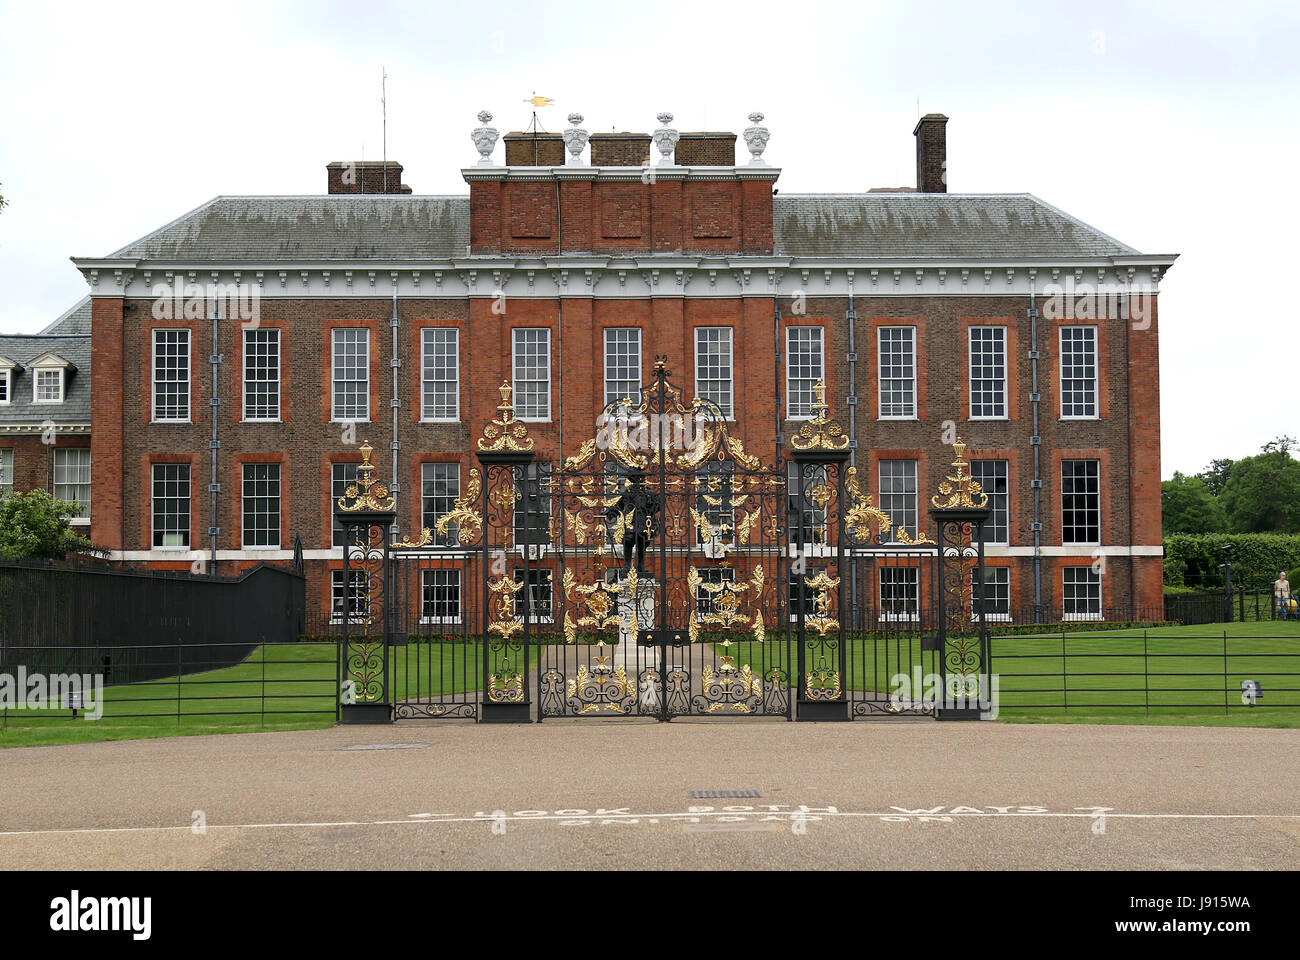 May 30, 2017 - Kensington Palace is a royal residence set in Kensington Gardens, in the Royal Borough of Kensington Stock Photo